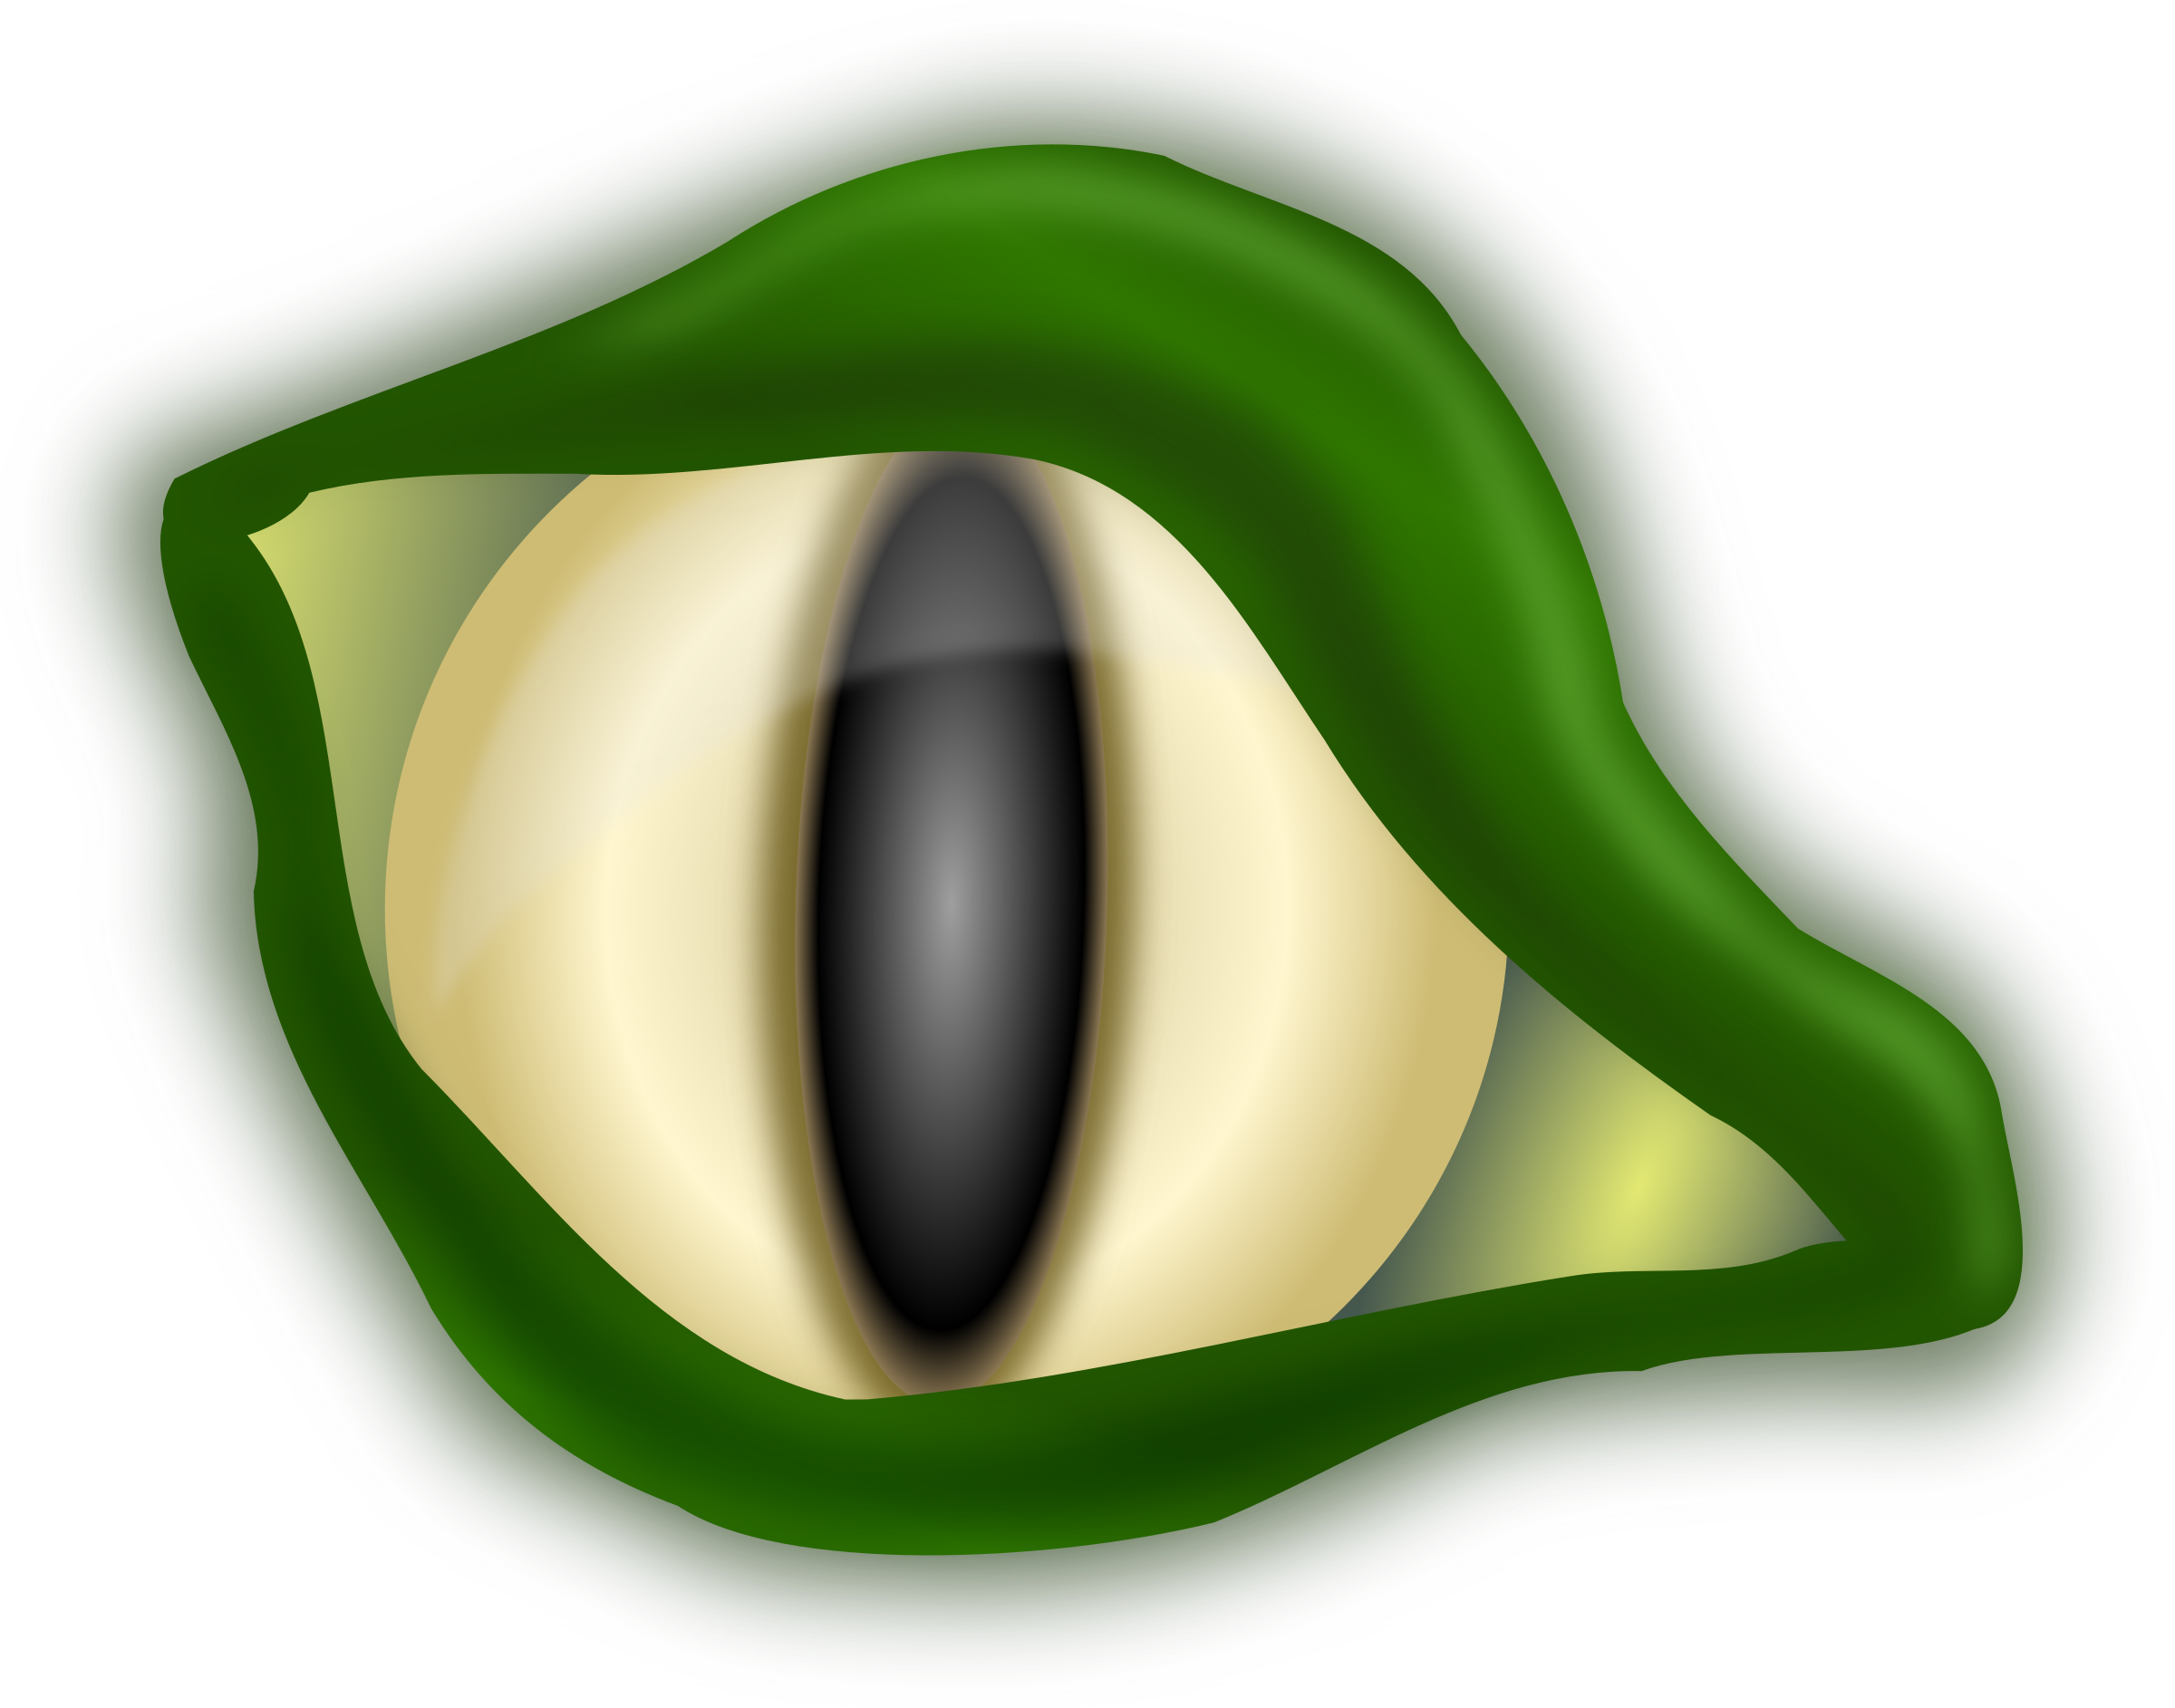 Gator clipart eyes, Gator eyes Transparent FREE for download on.